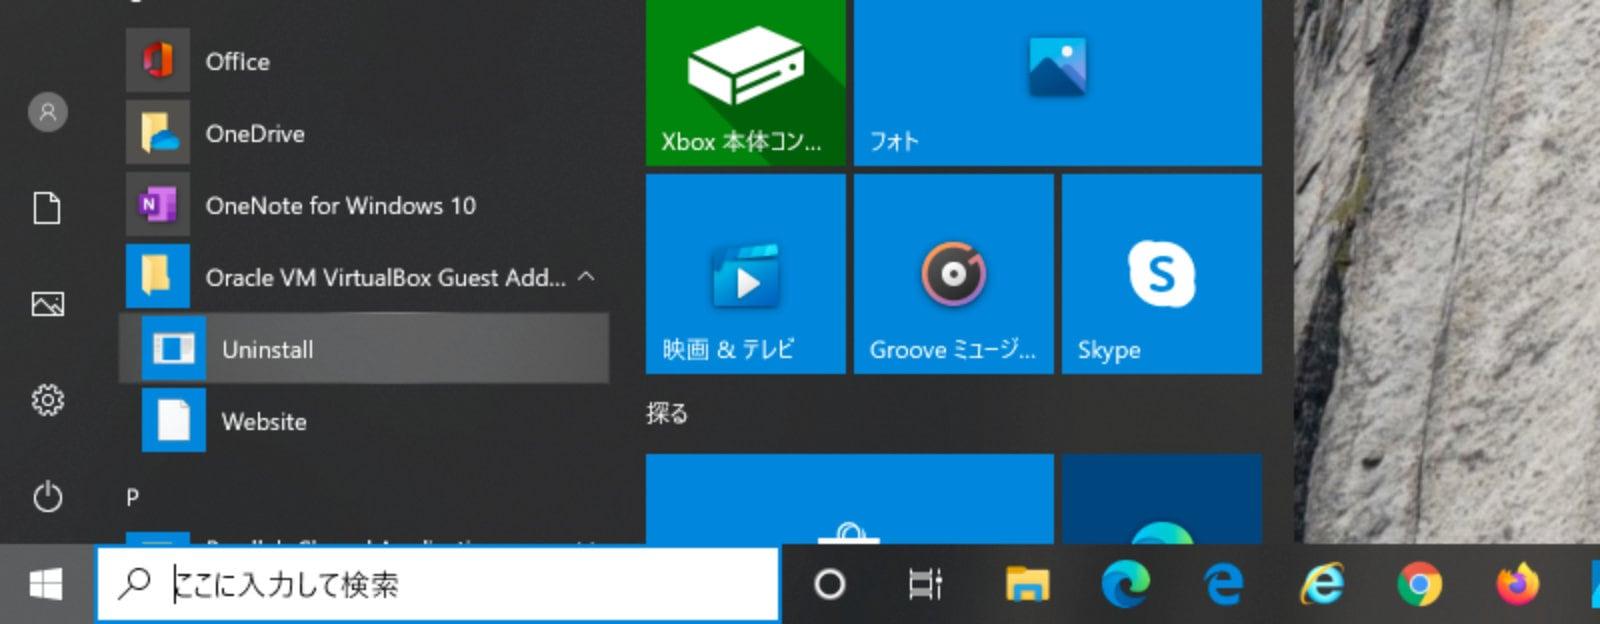 WindowsスタートメニューでOracle VM Virtual Guest AdditionsのUninstallメニューが表示された状態のキャプチャ画像